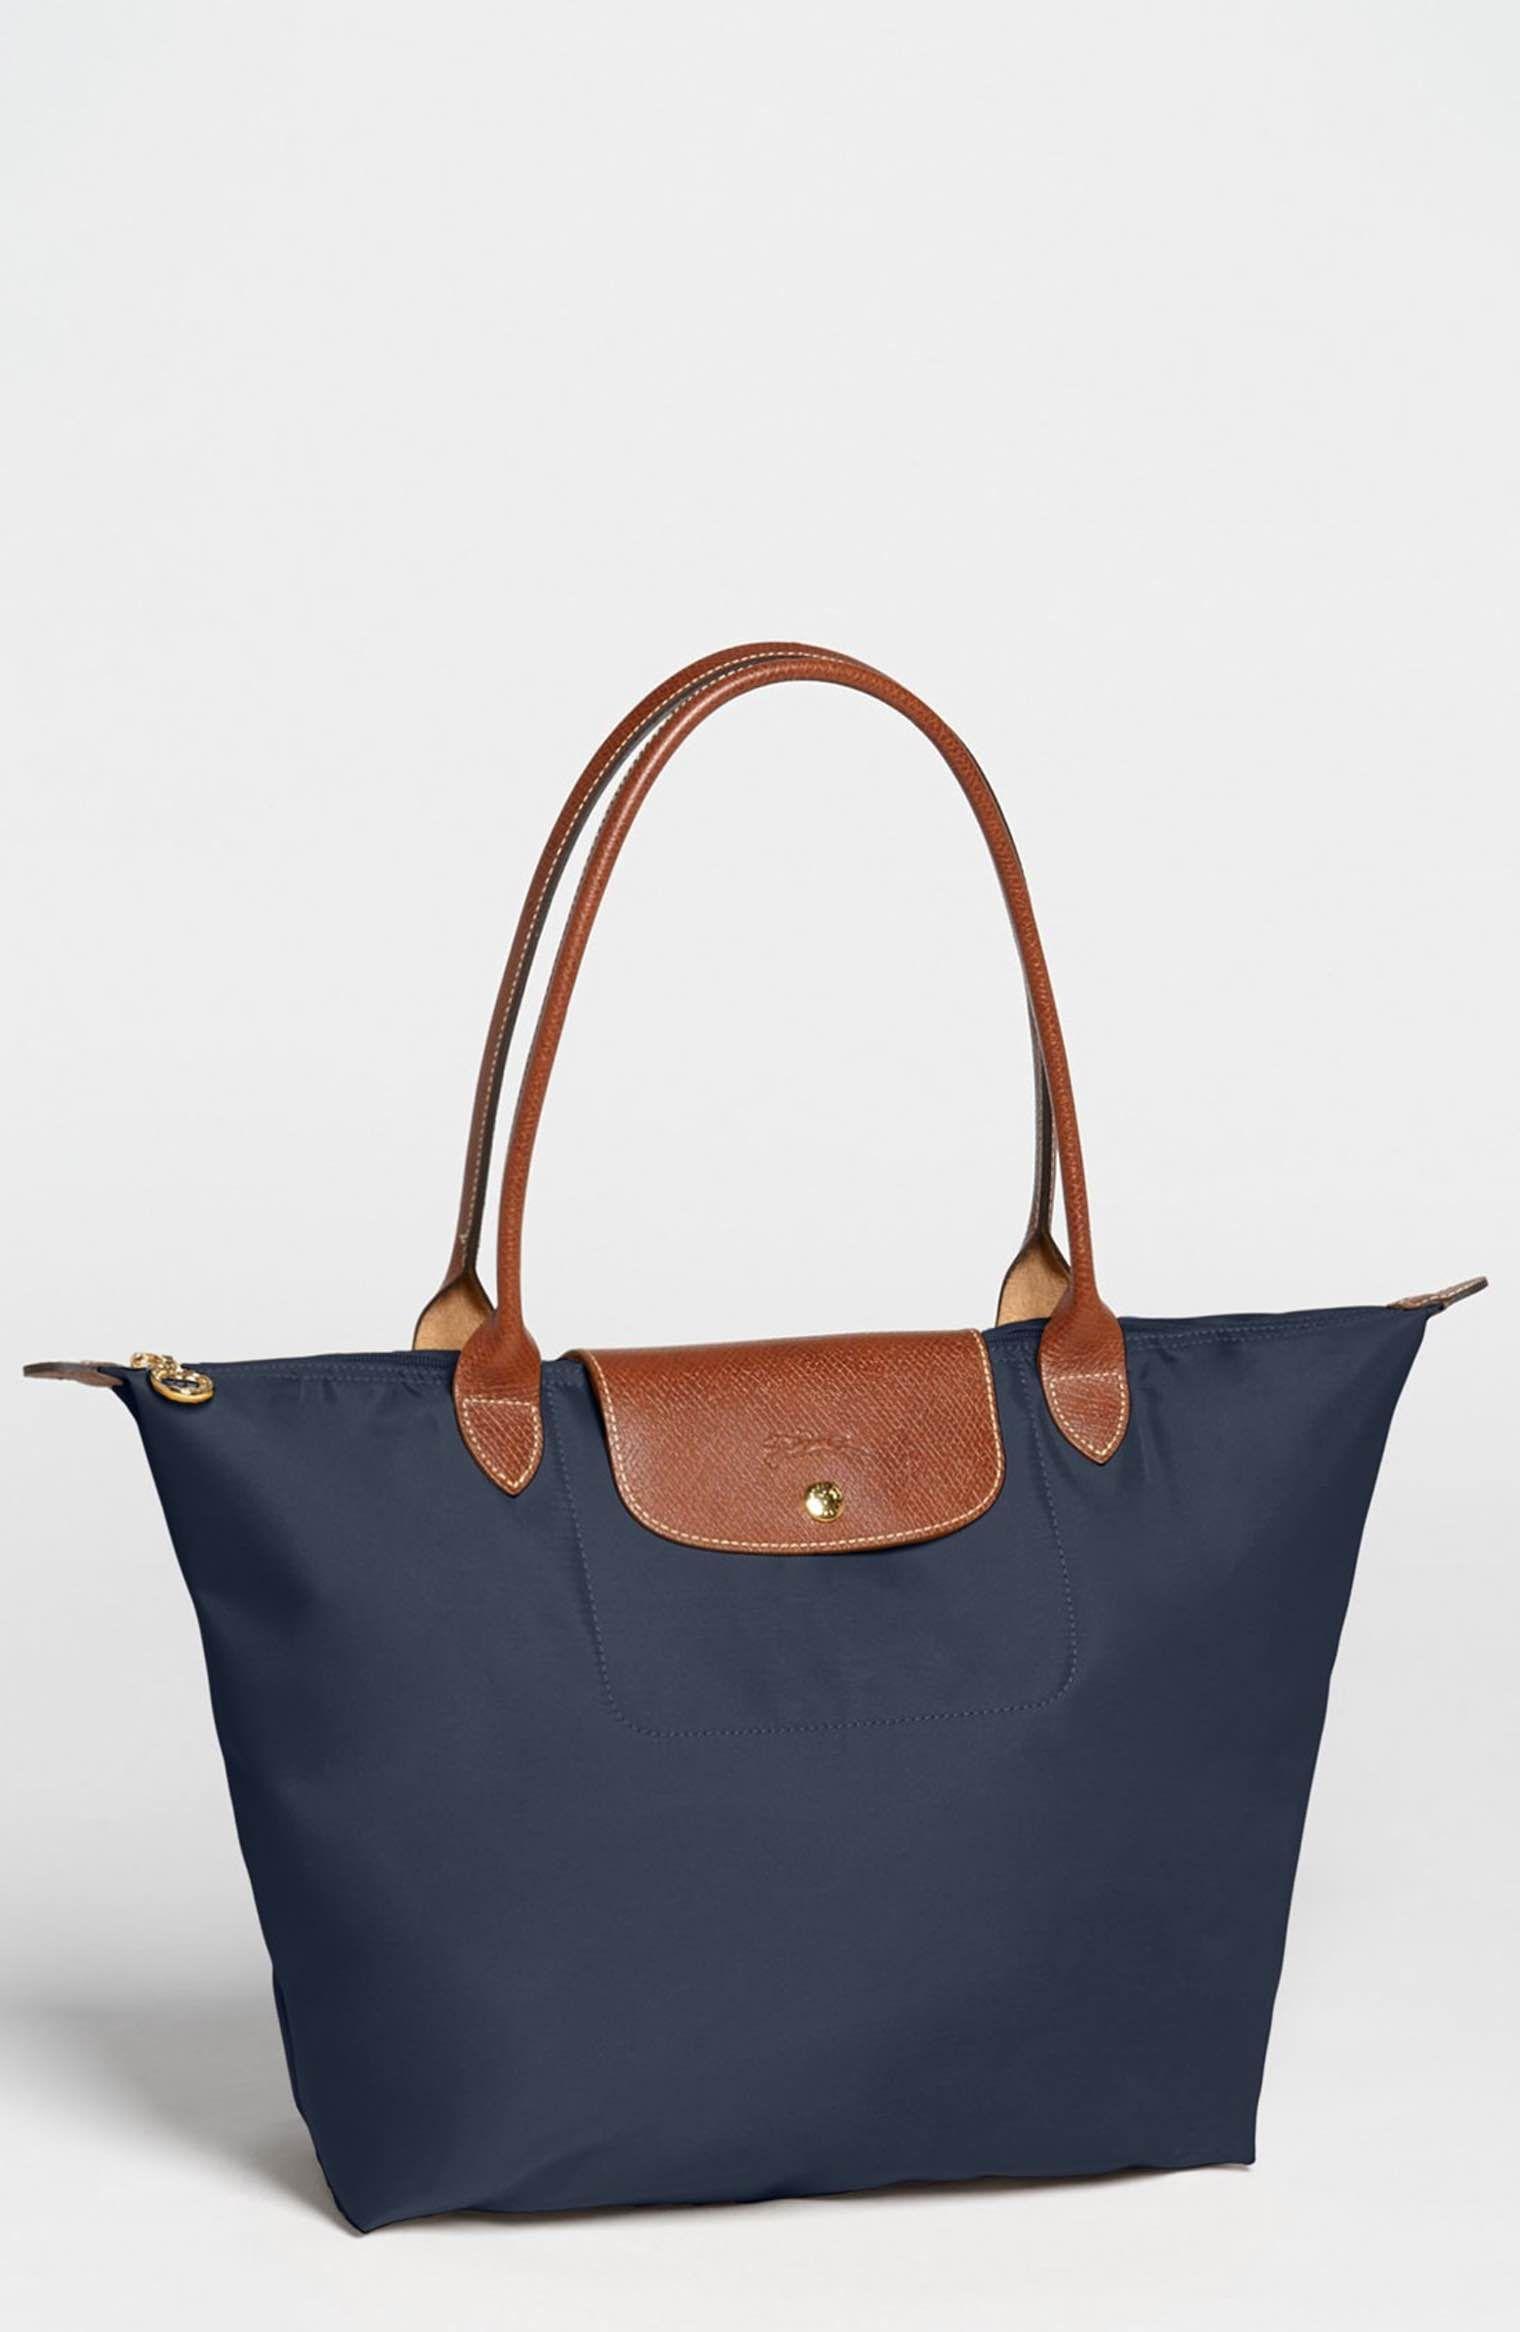 Happy Birthday To Longchamp's Le Pliage Bag